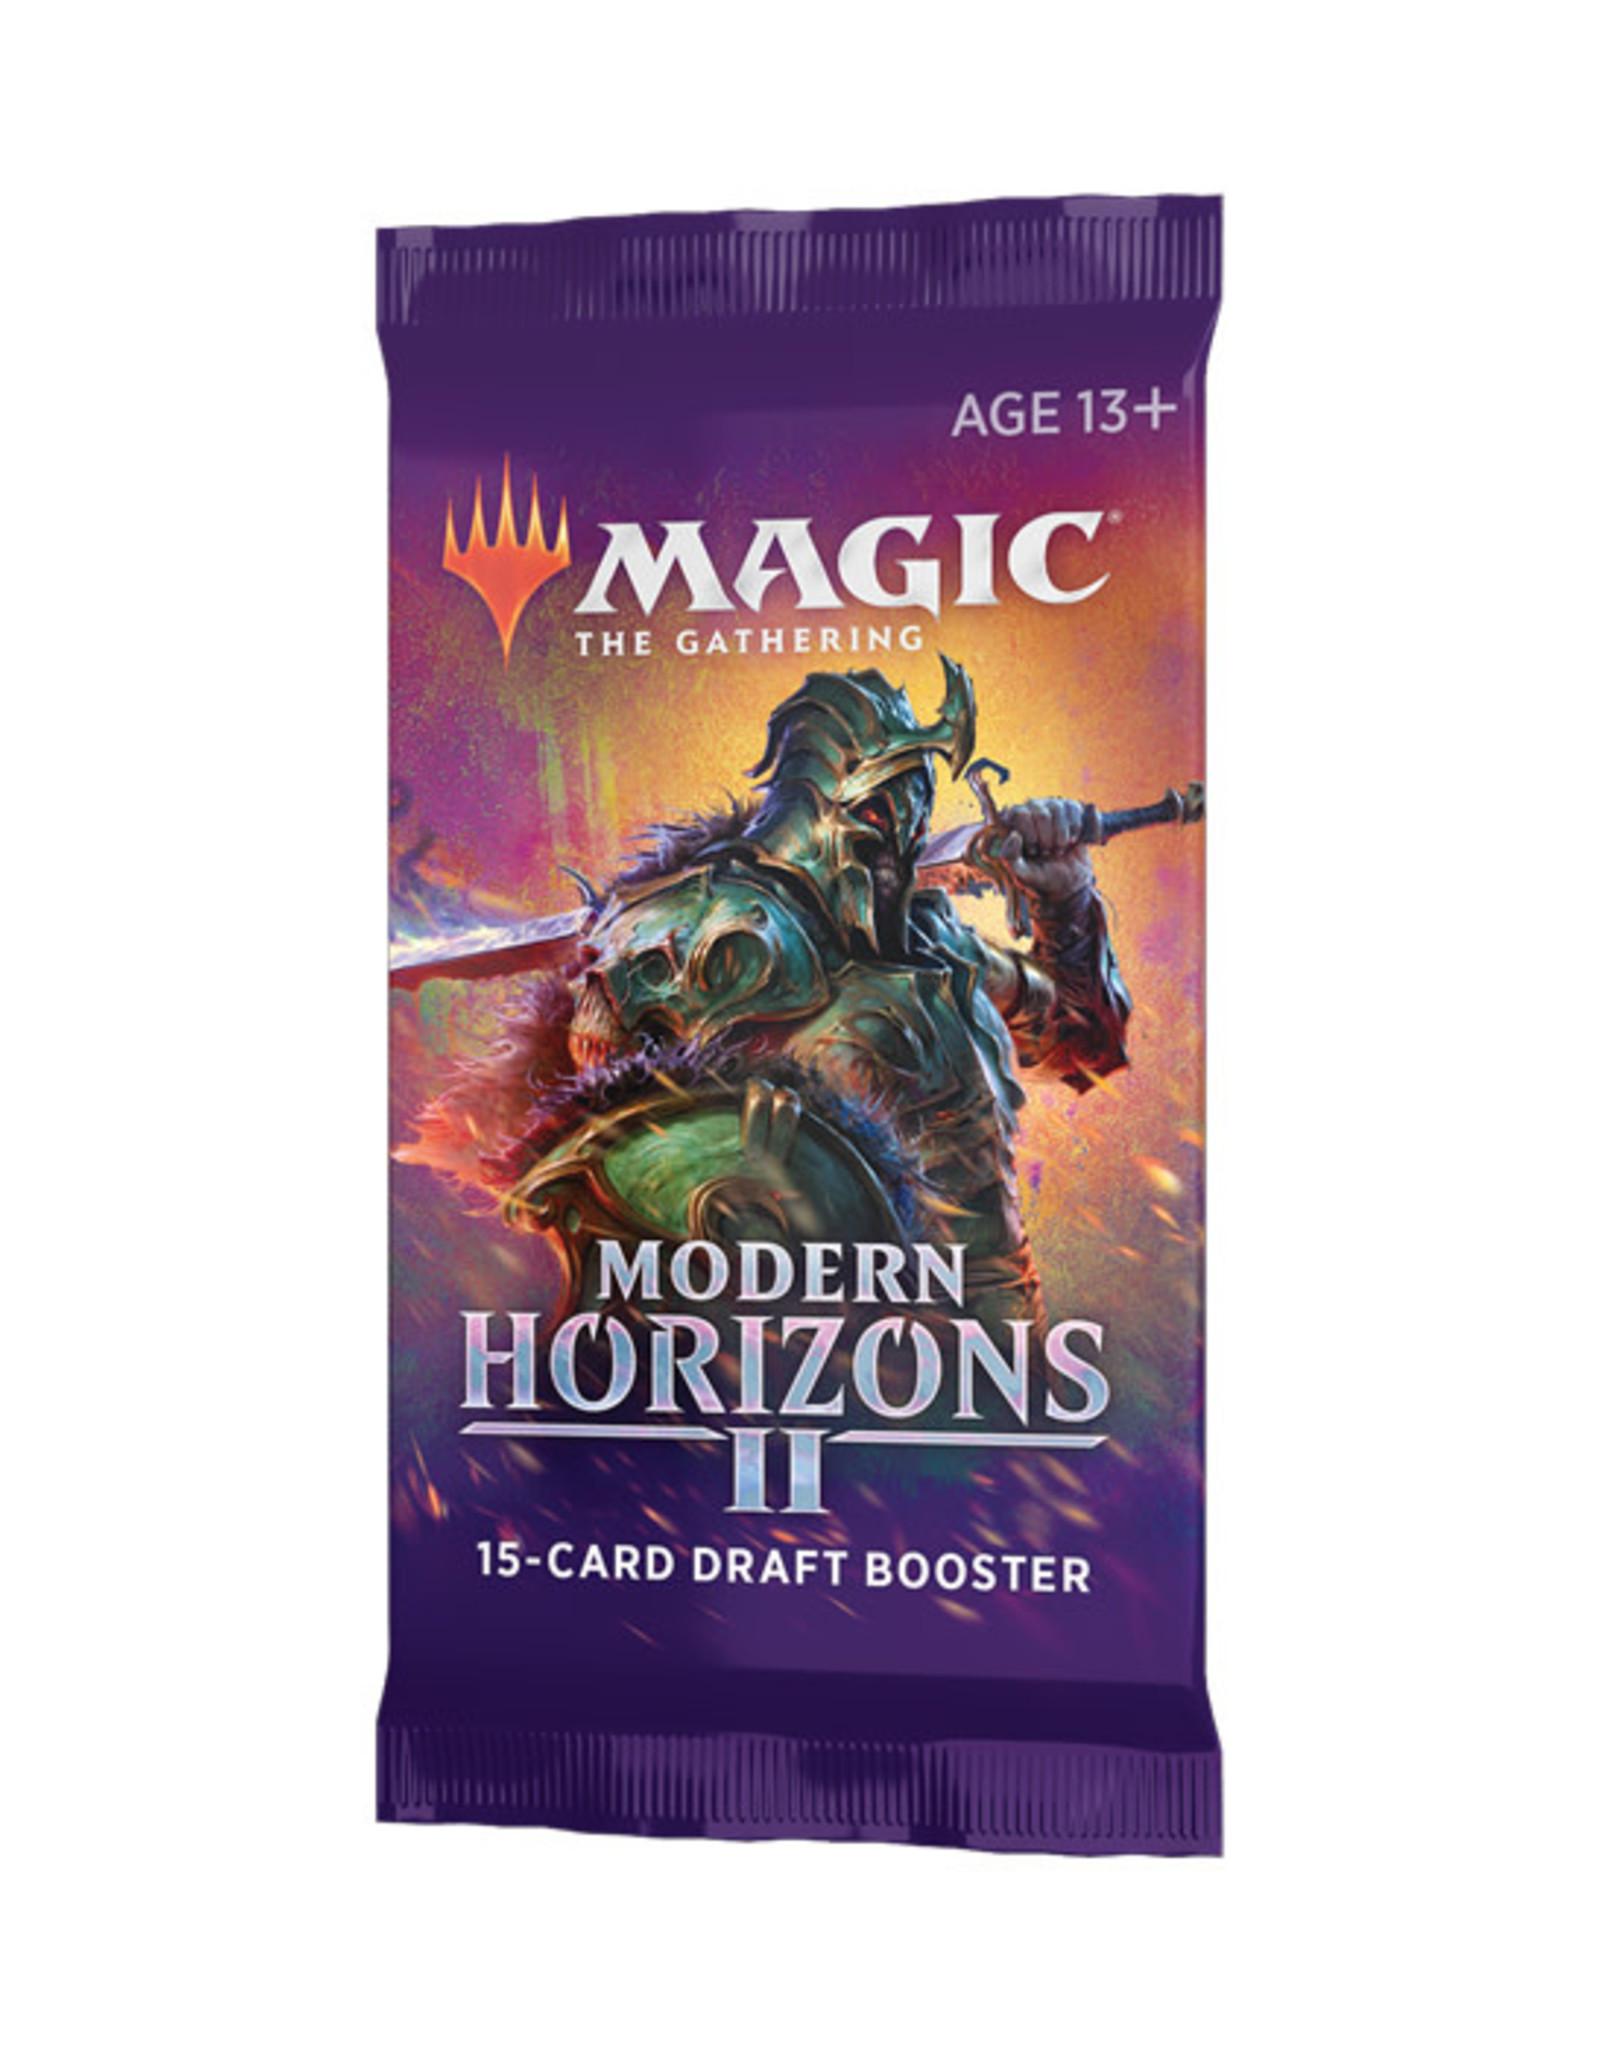 Magic: The Gathering Magic: The Gathering - Modern Horizons 2 - Draft Booster Pack